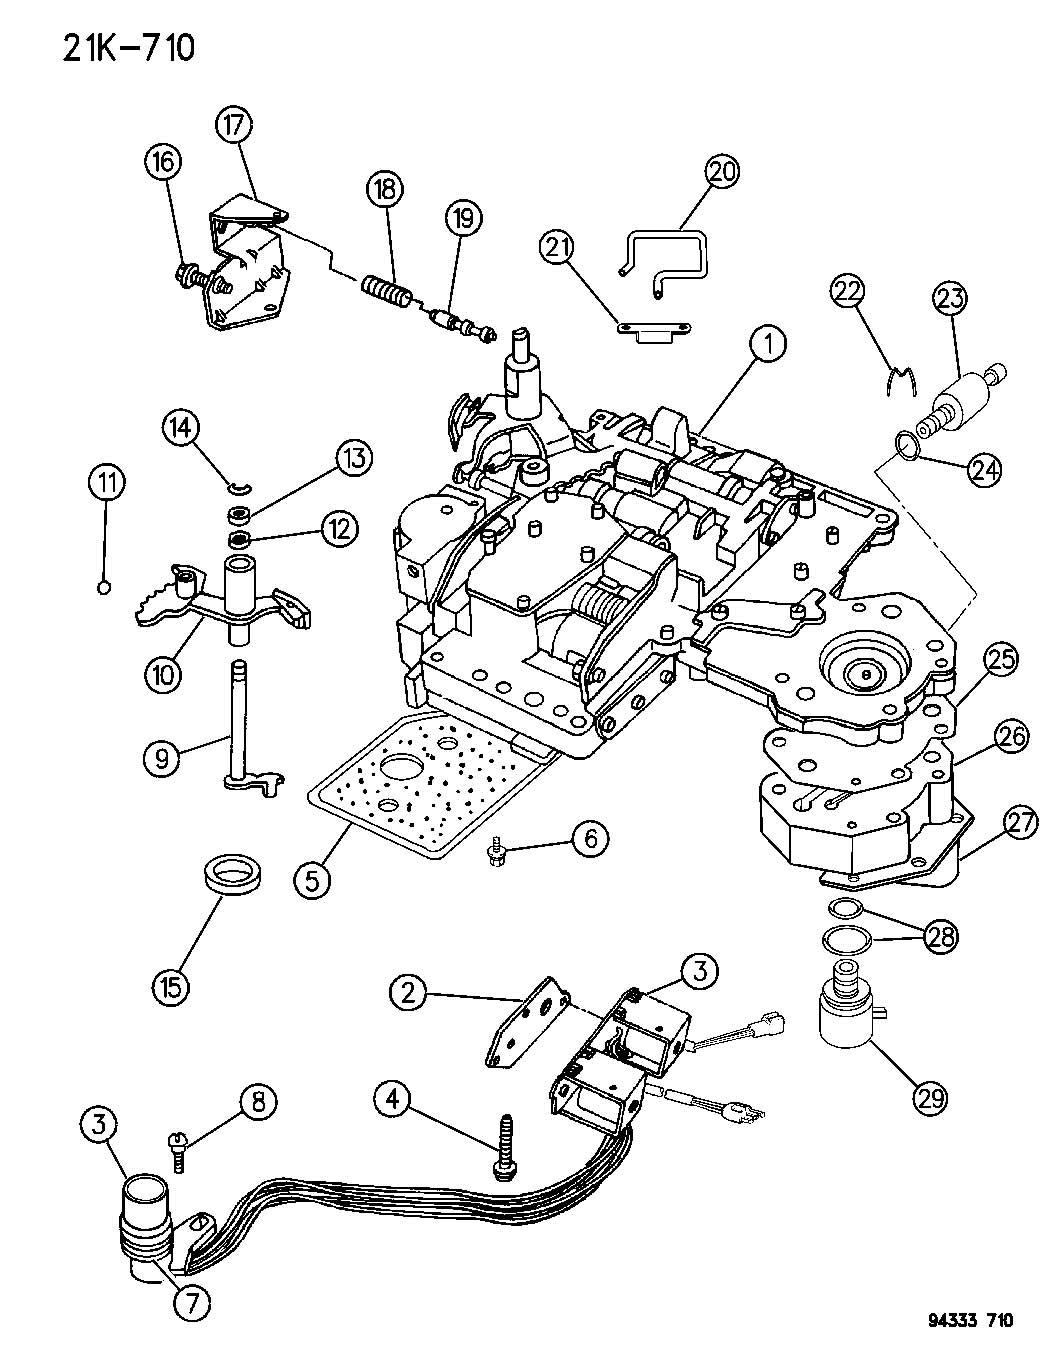 47re wiring diagram 2005 chevy impala stereo 44re transmission 47rh